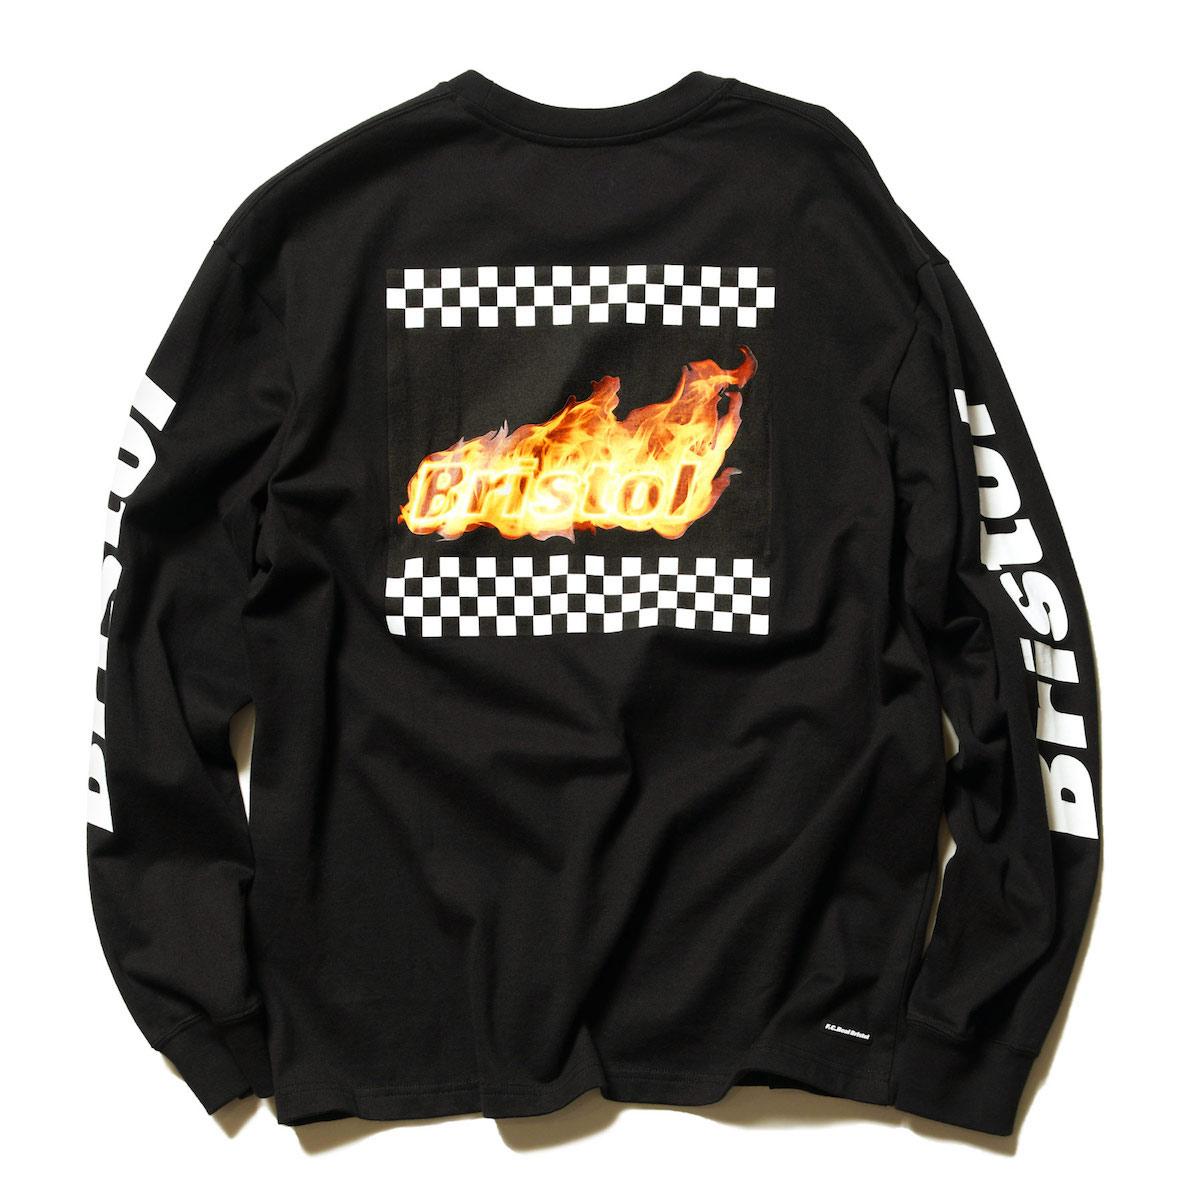 F.C.Real Bristol / CHECKER FLAME L/S TEE -Black